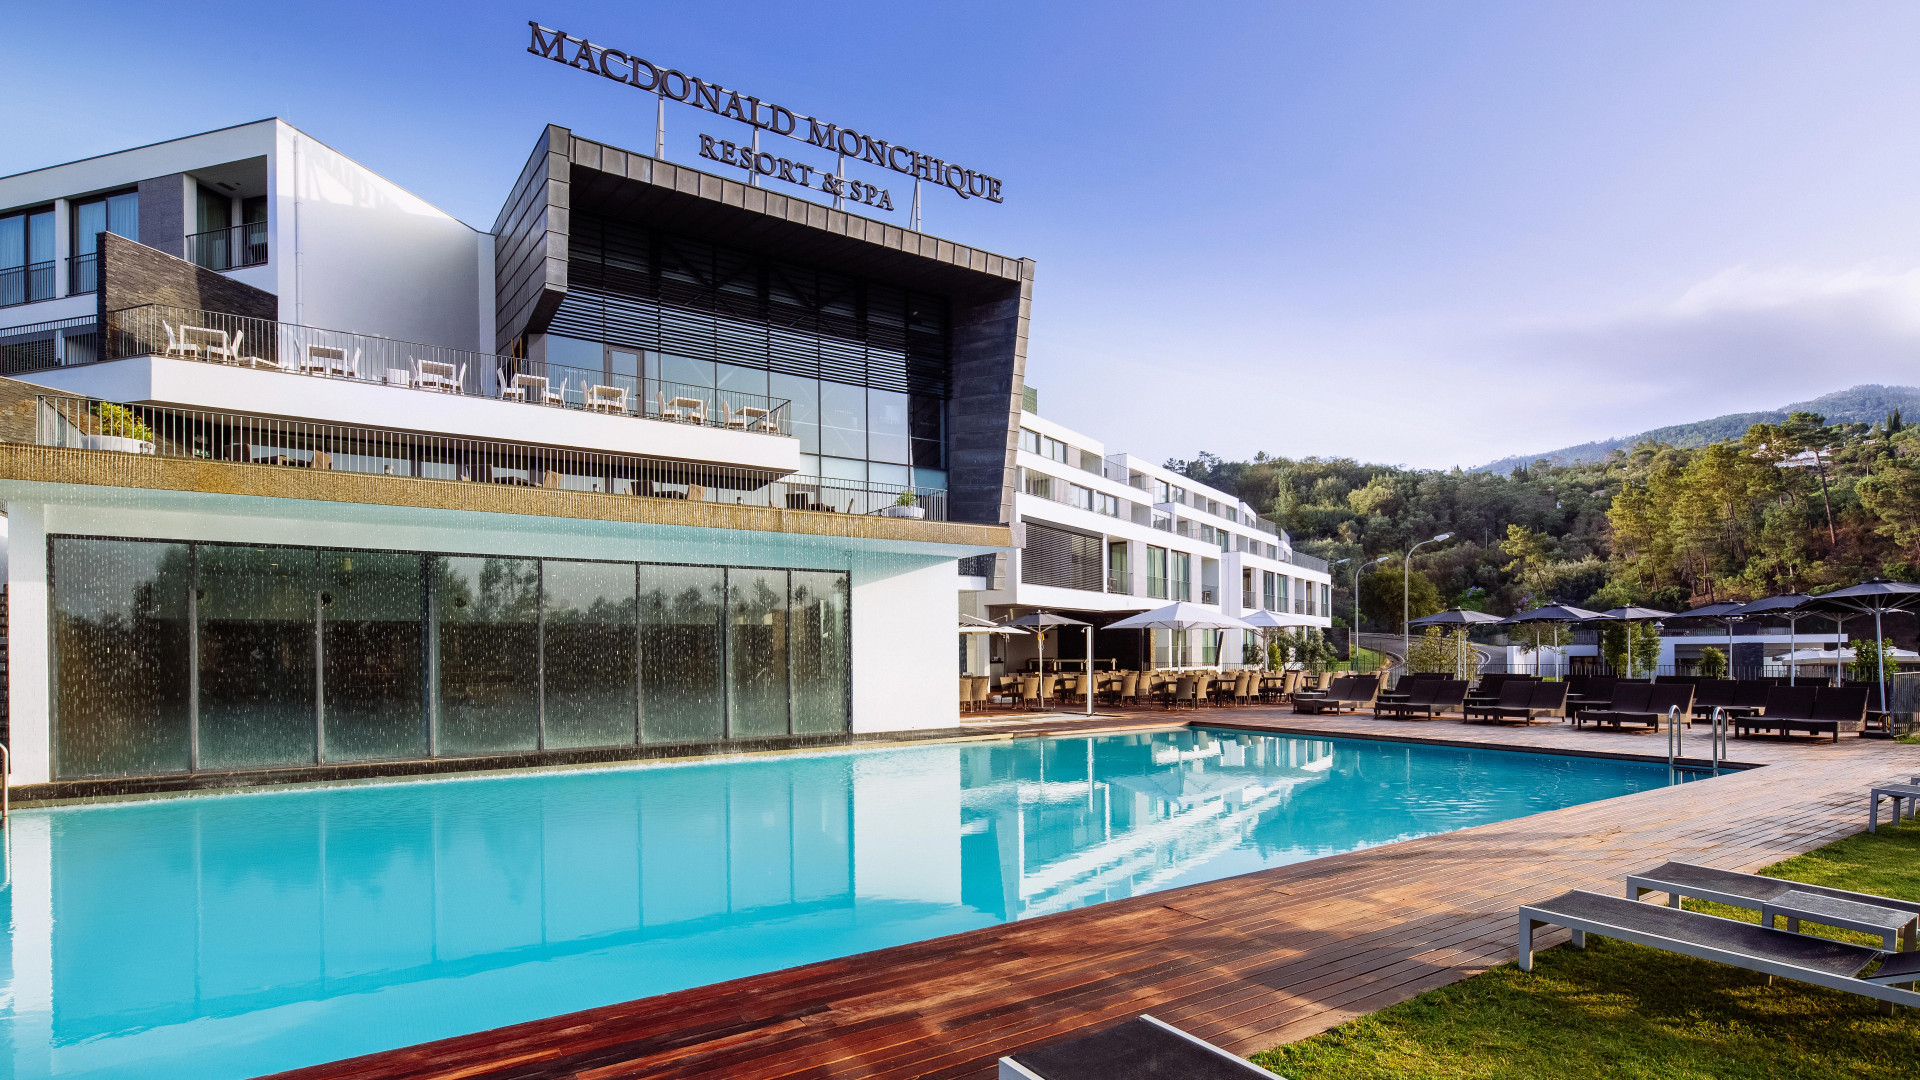 Exterior of Macdonald Monchique Resort & Spa, Algarve